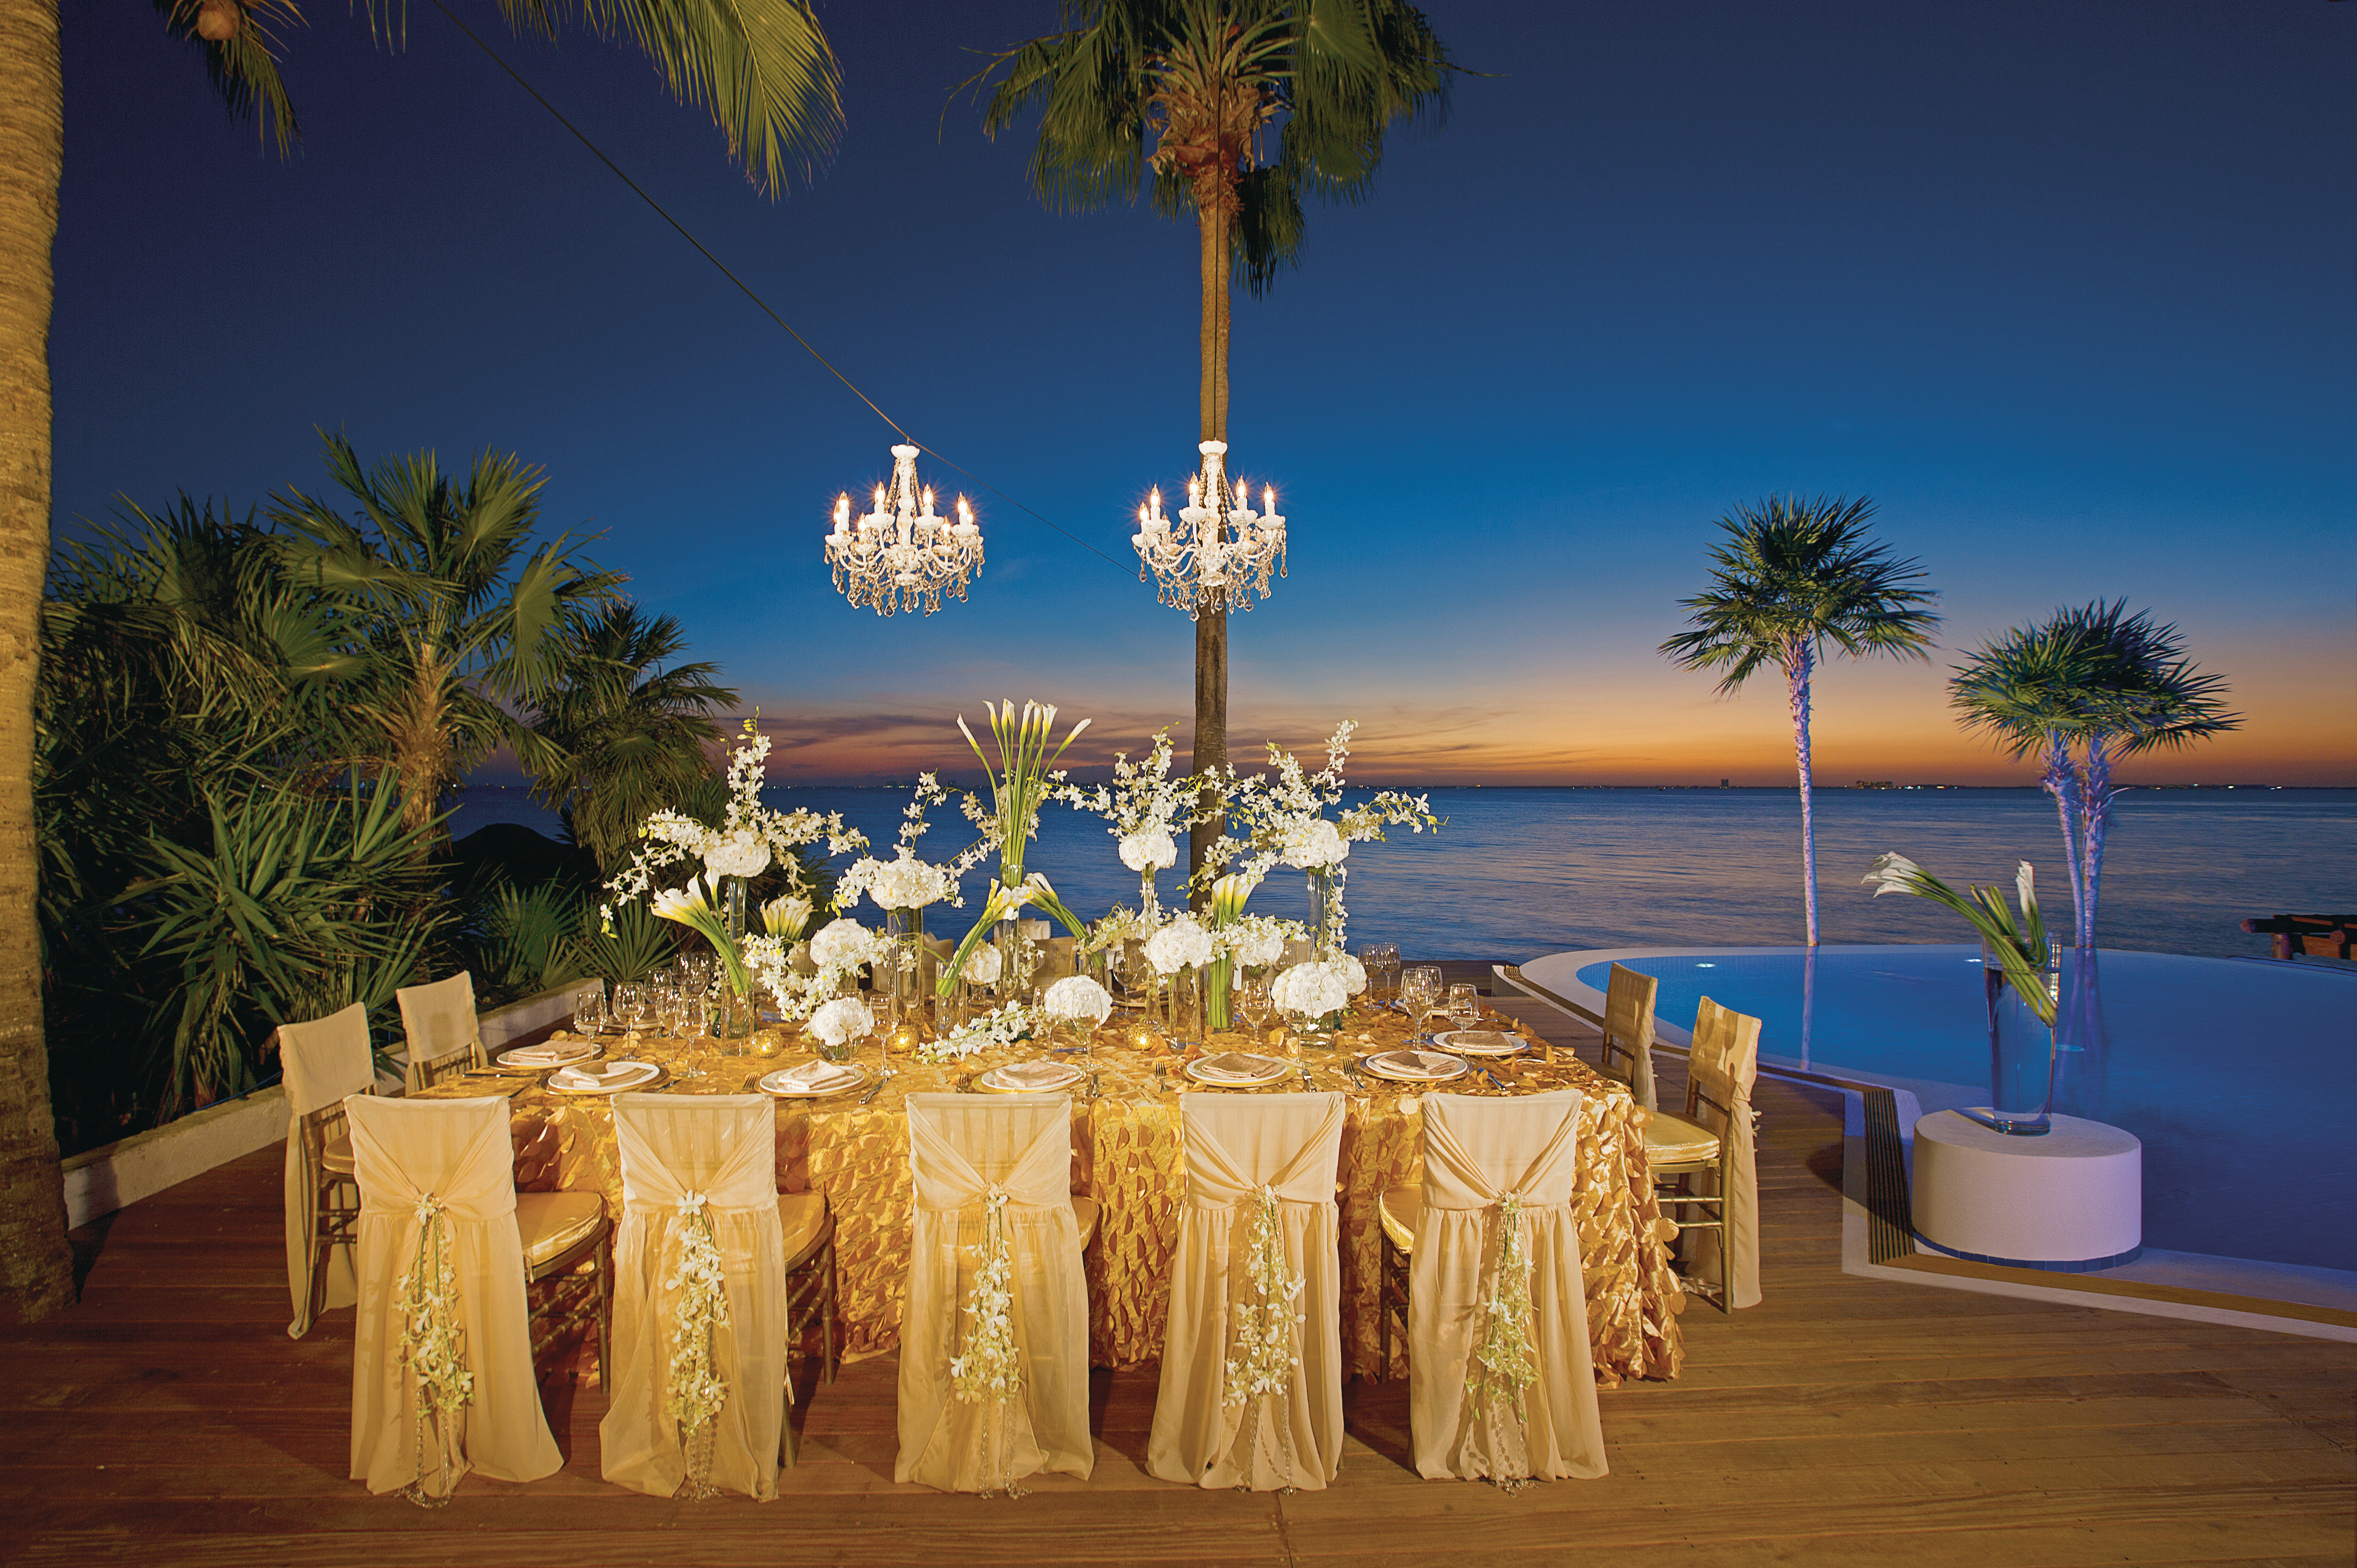 Travel Agency All-Inclusive Resort Zoetry Villa Rolandi Isla Mujeres Cancun 17